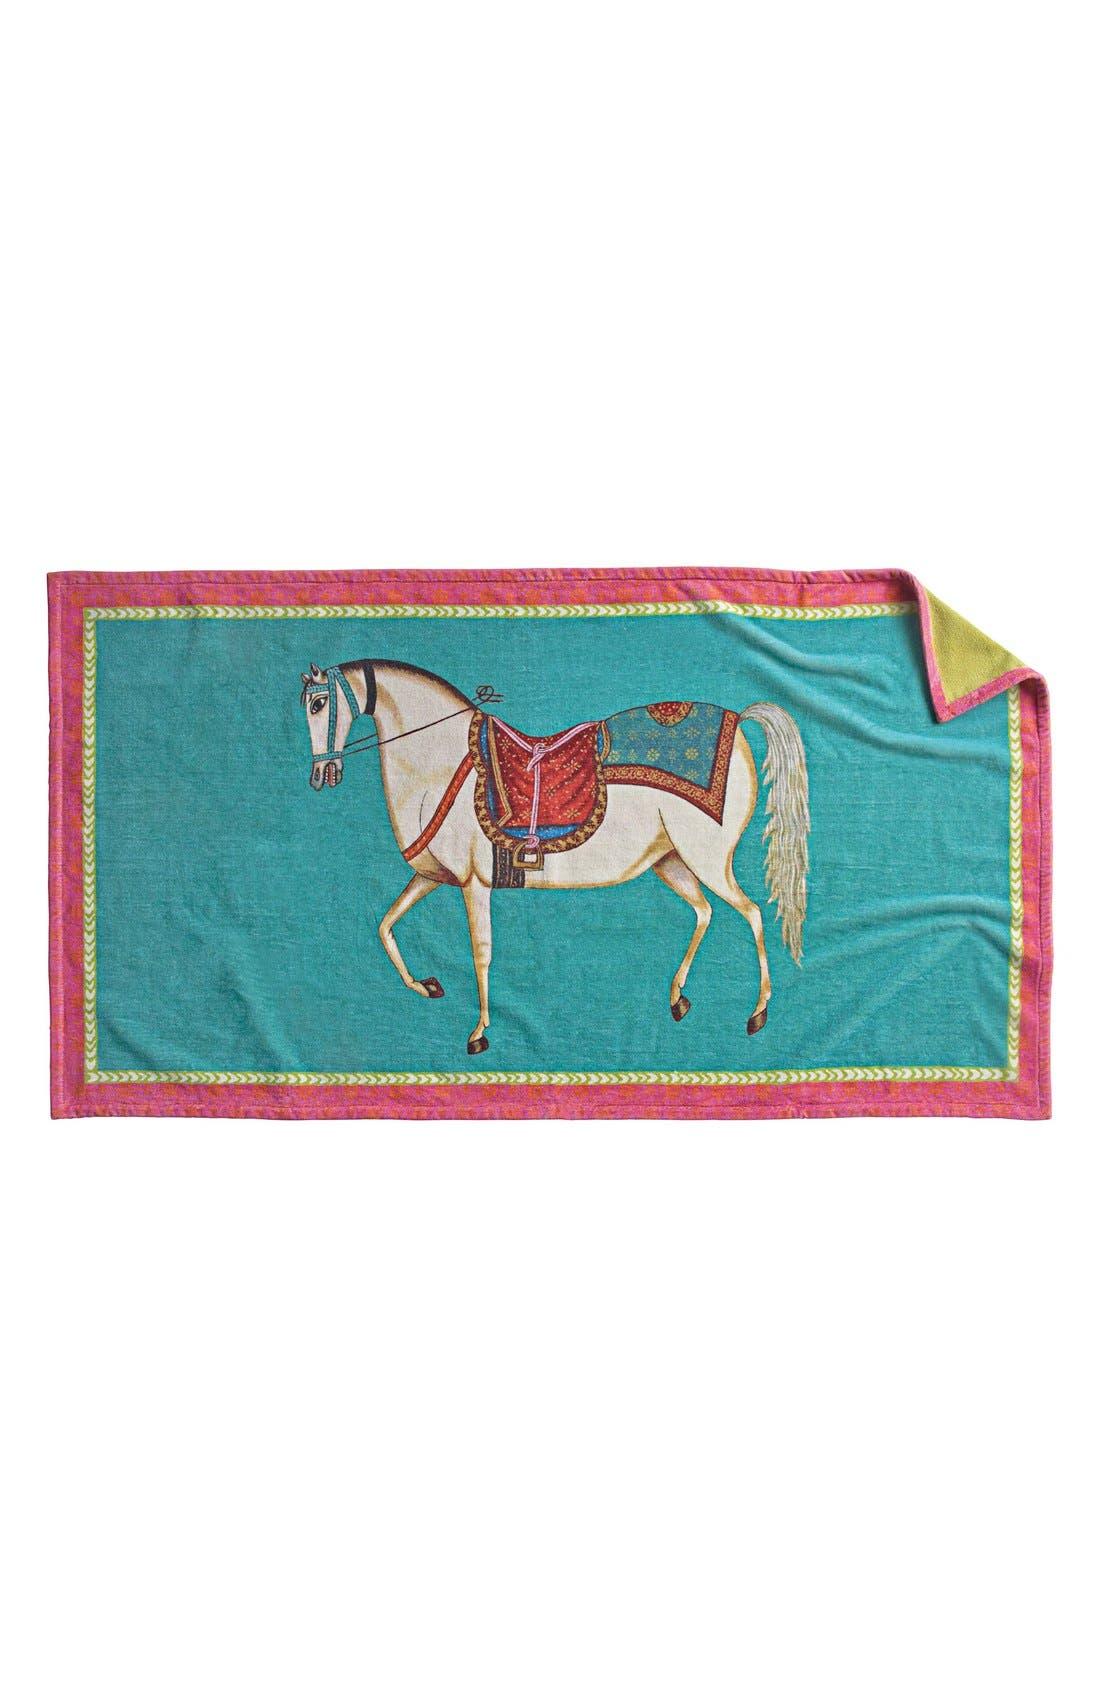 Main Image - John Robshaw 'Horse' Beach Towel